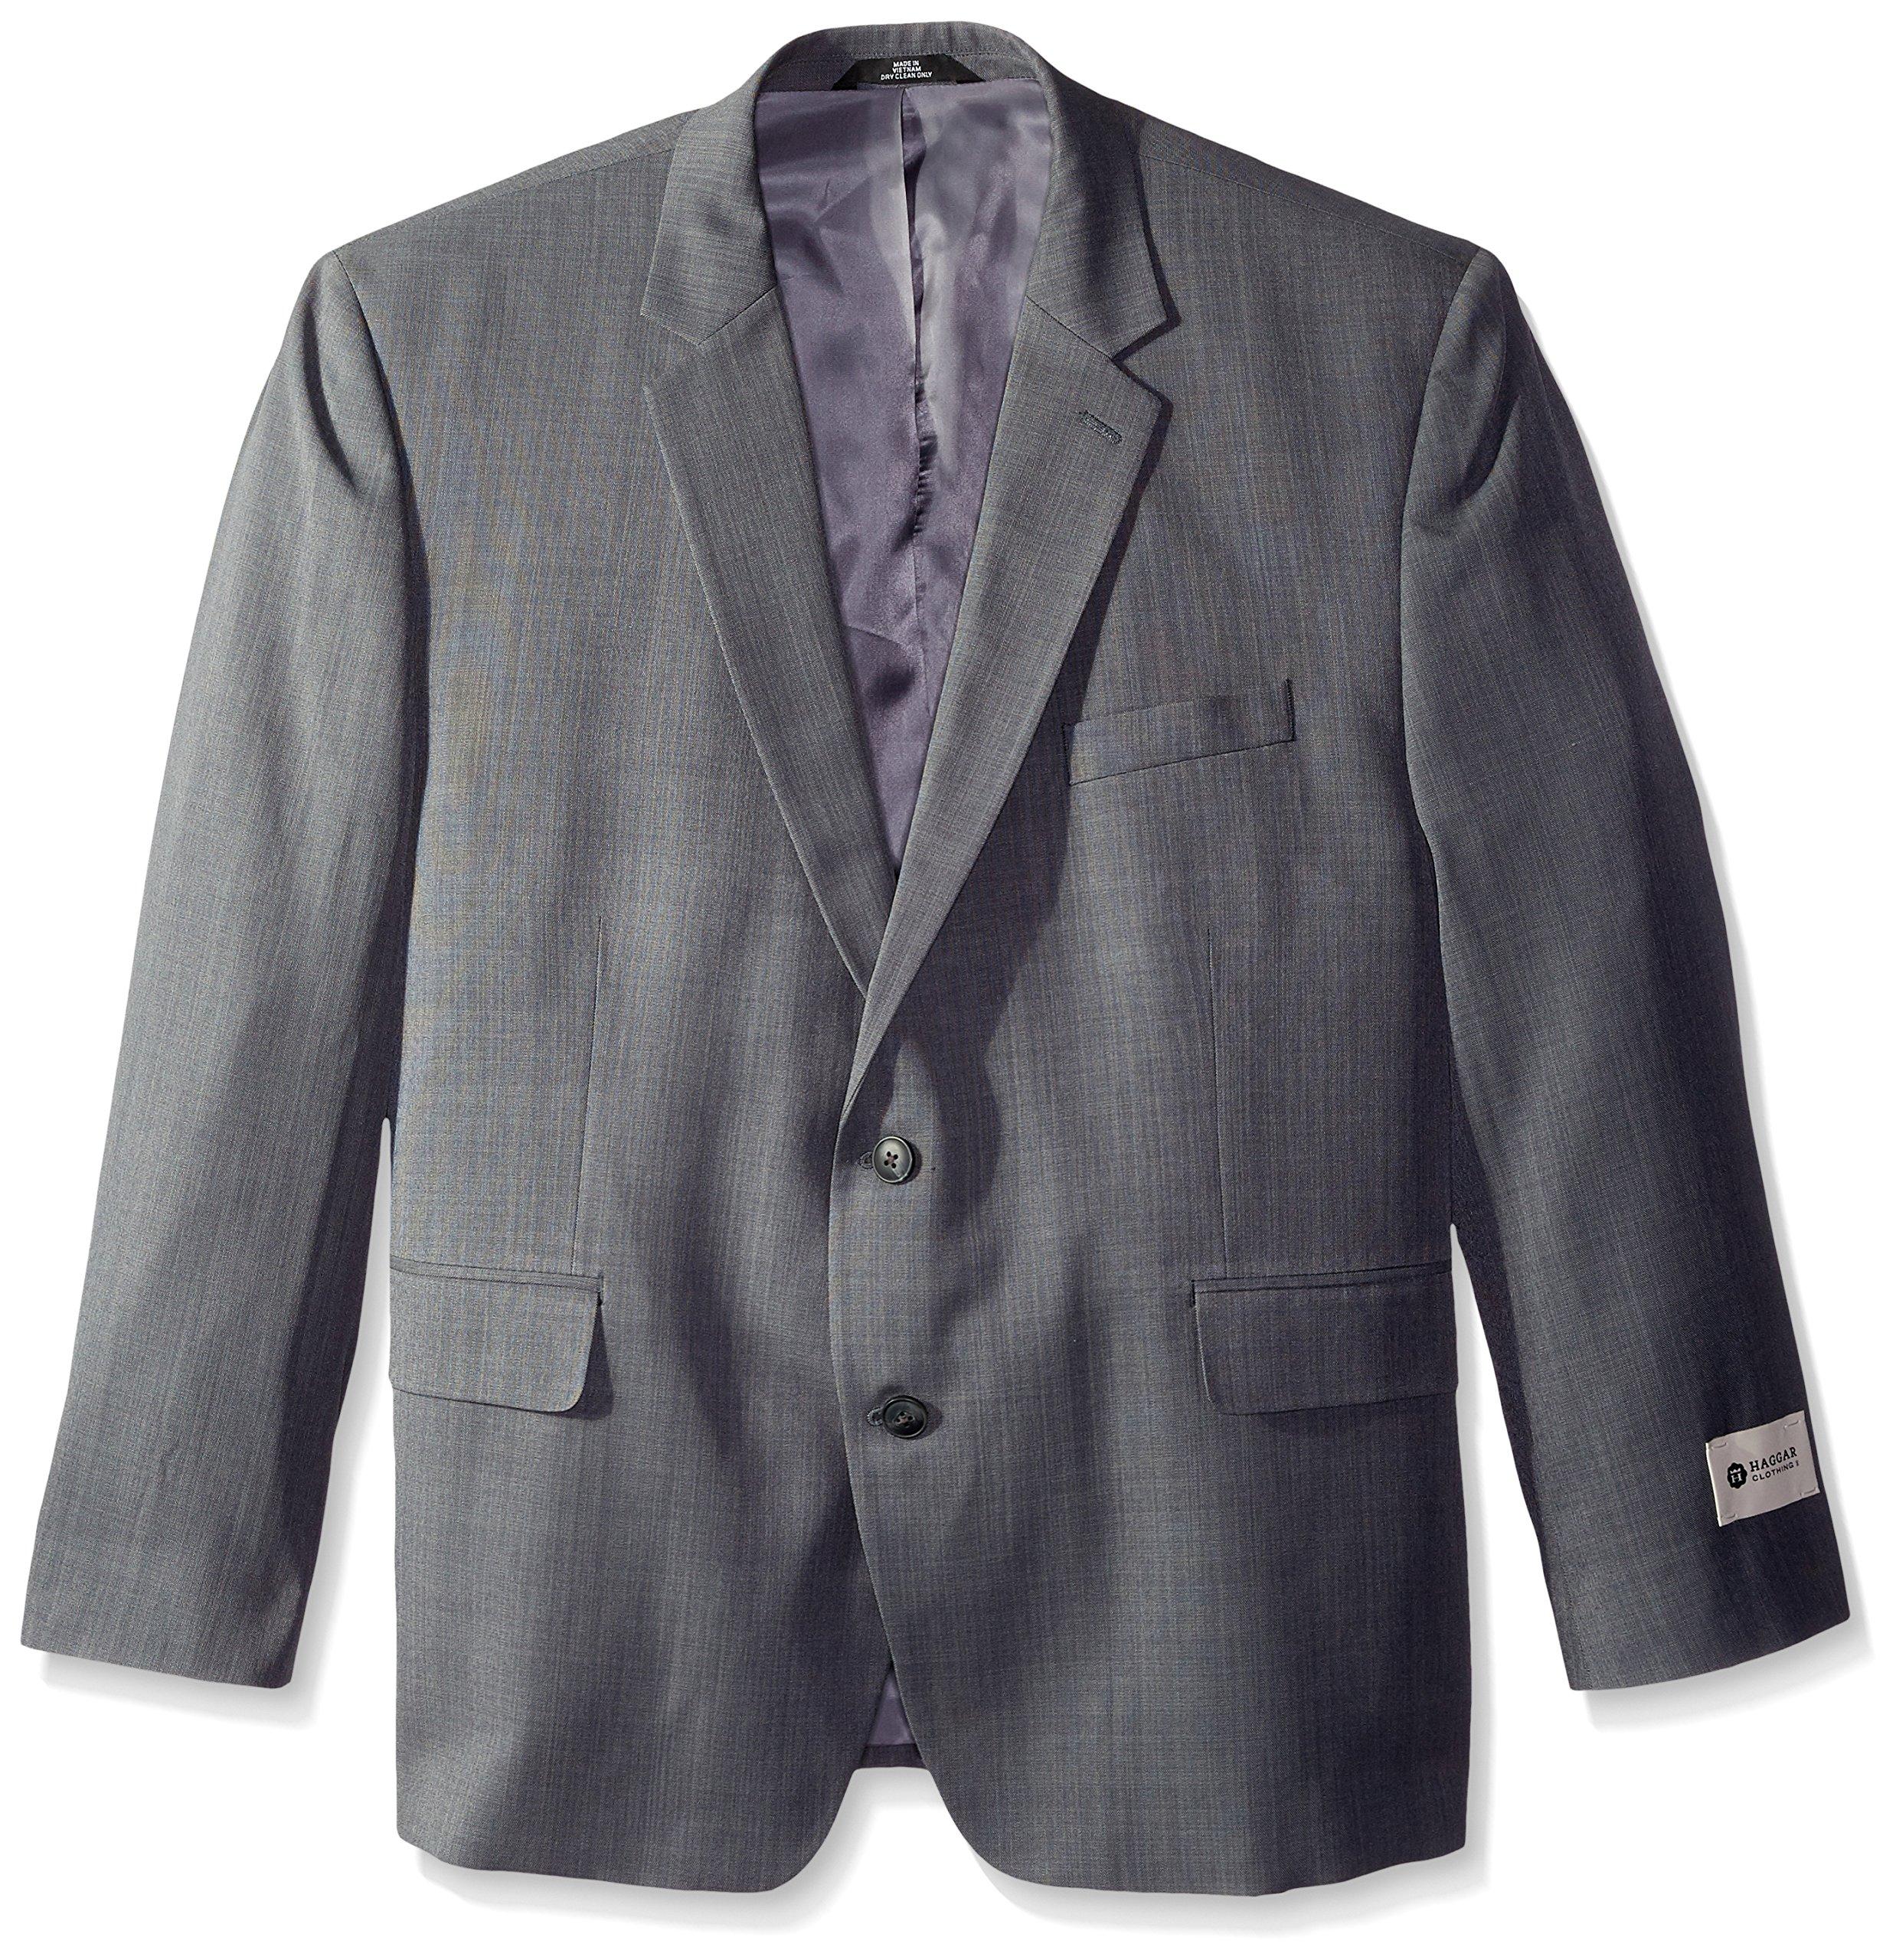 Haggar Men's Big-Tall Performance Stria Gabardine Classic Fit Suit Separate Coat, Graphite, 56 Long by Haggar